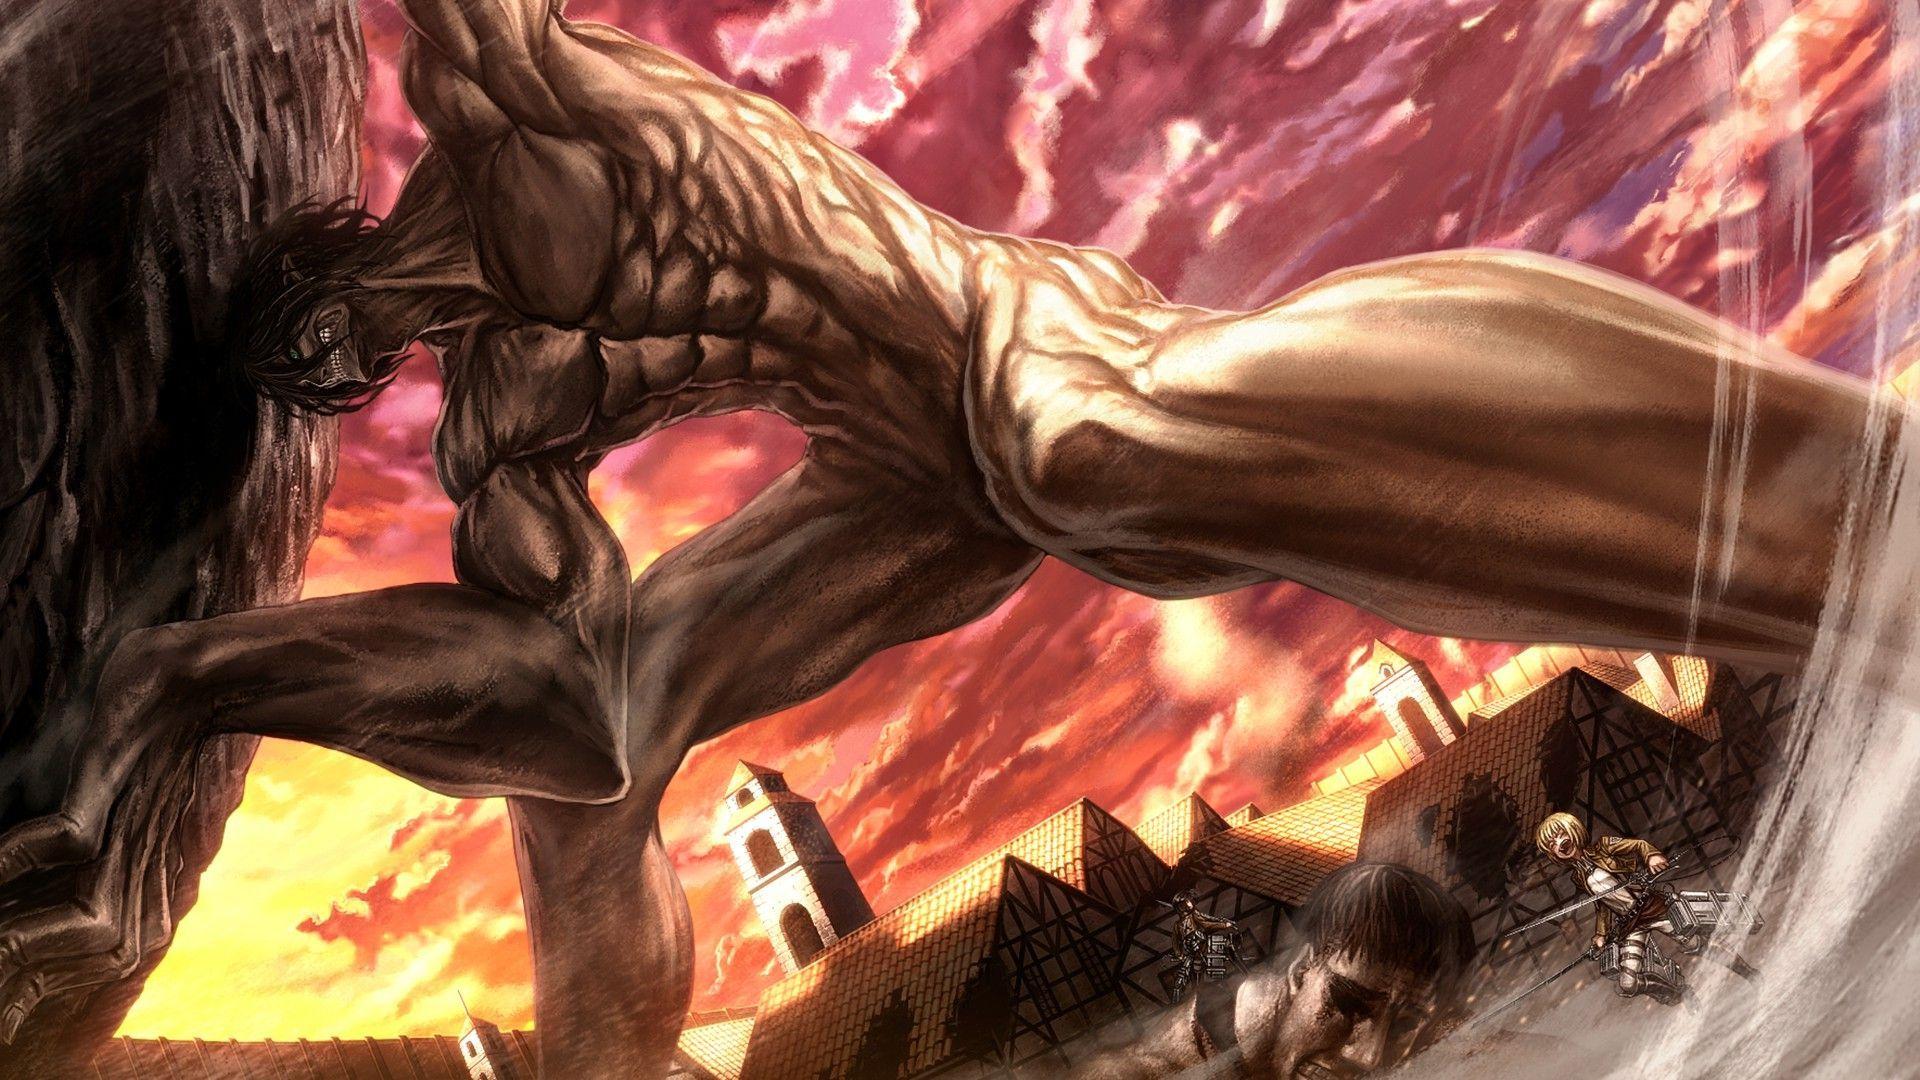 Eren Yeager   Attack on Titan wallpaper 16459 1920x1080